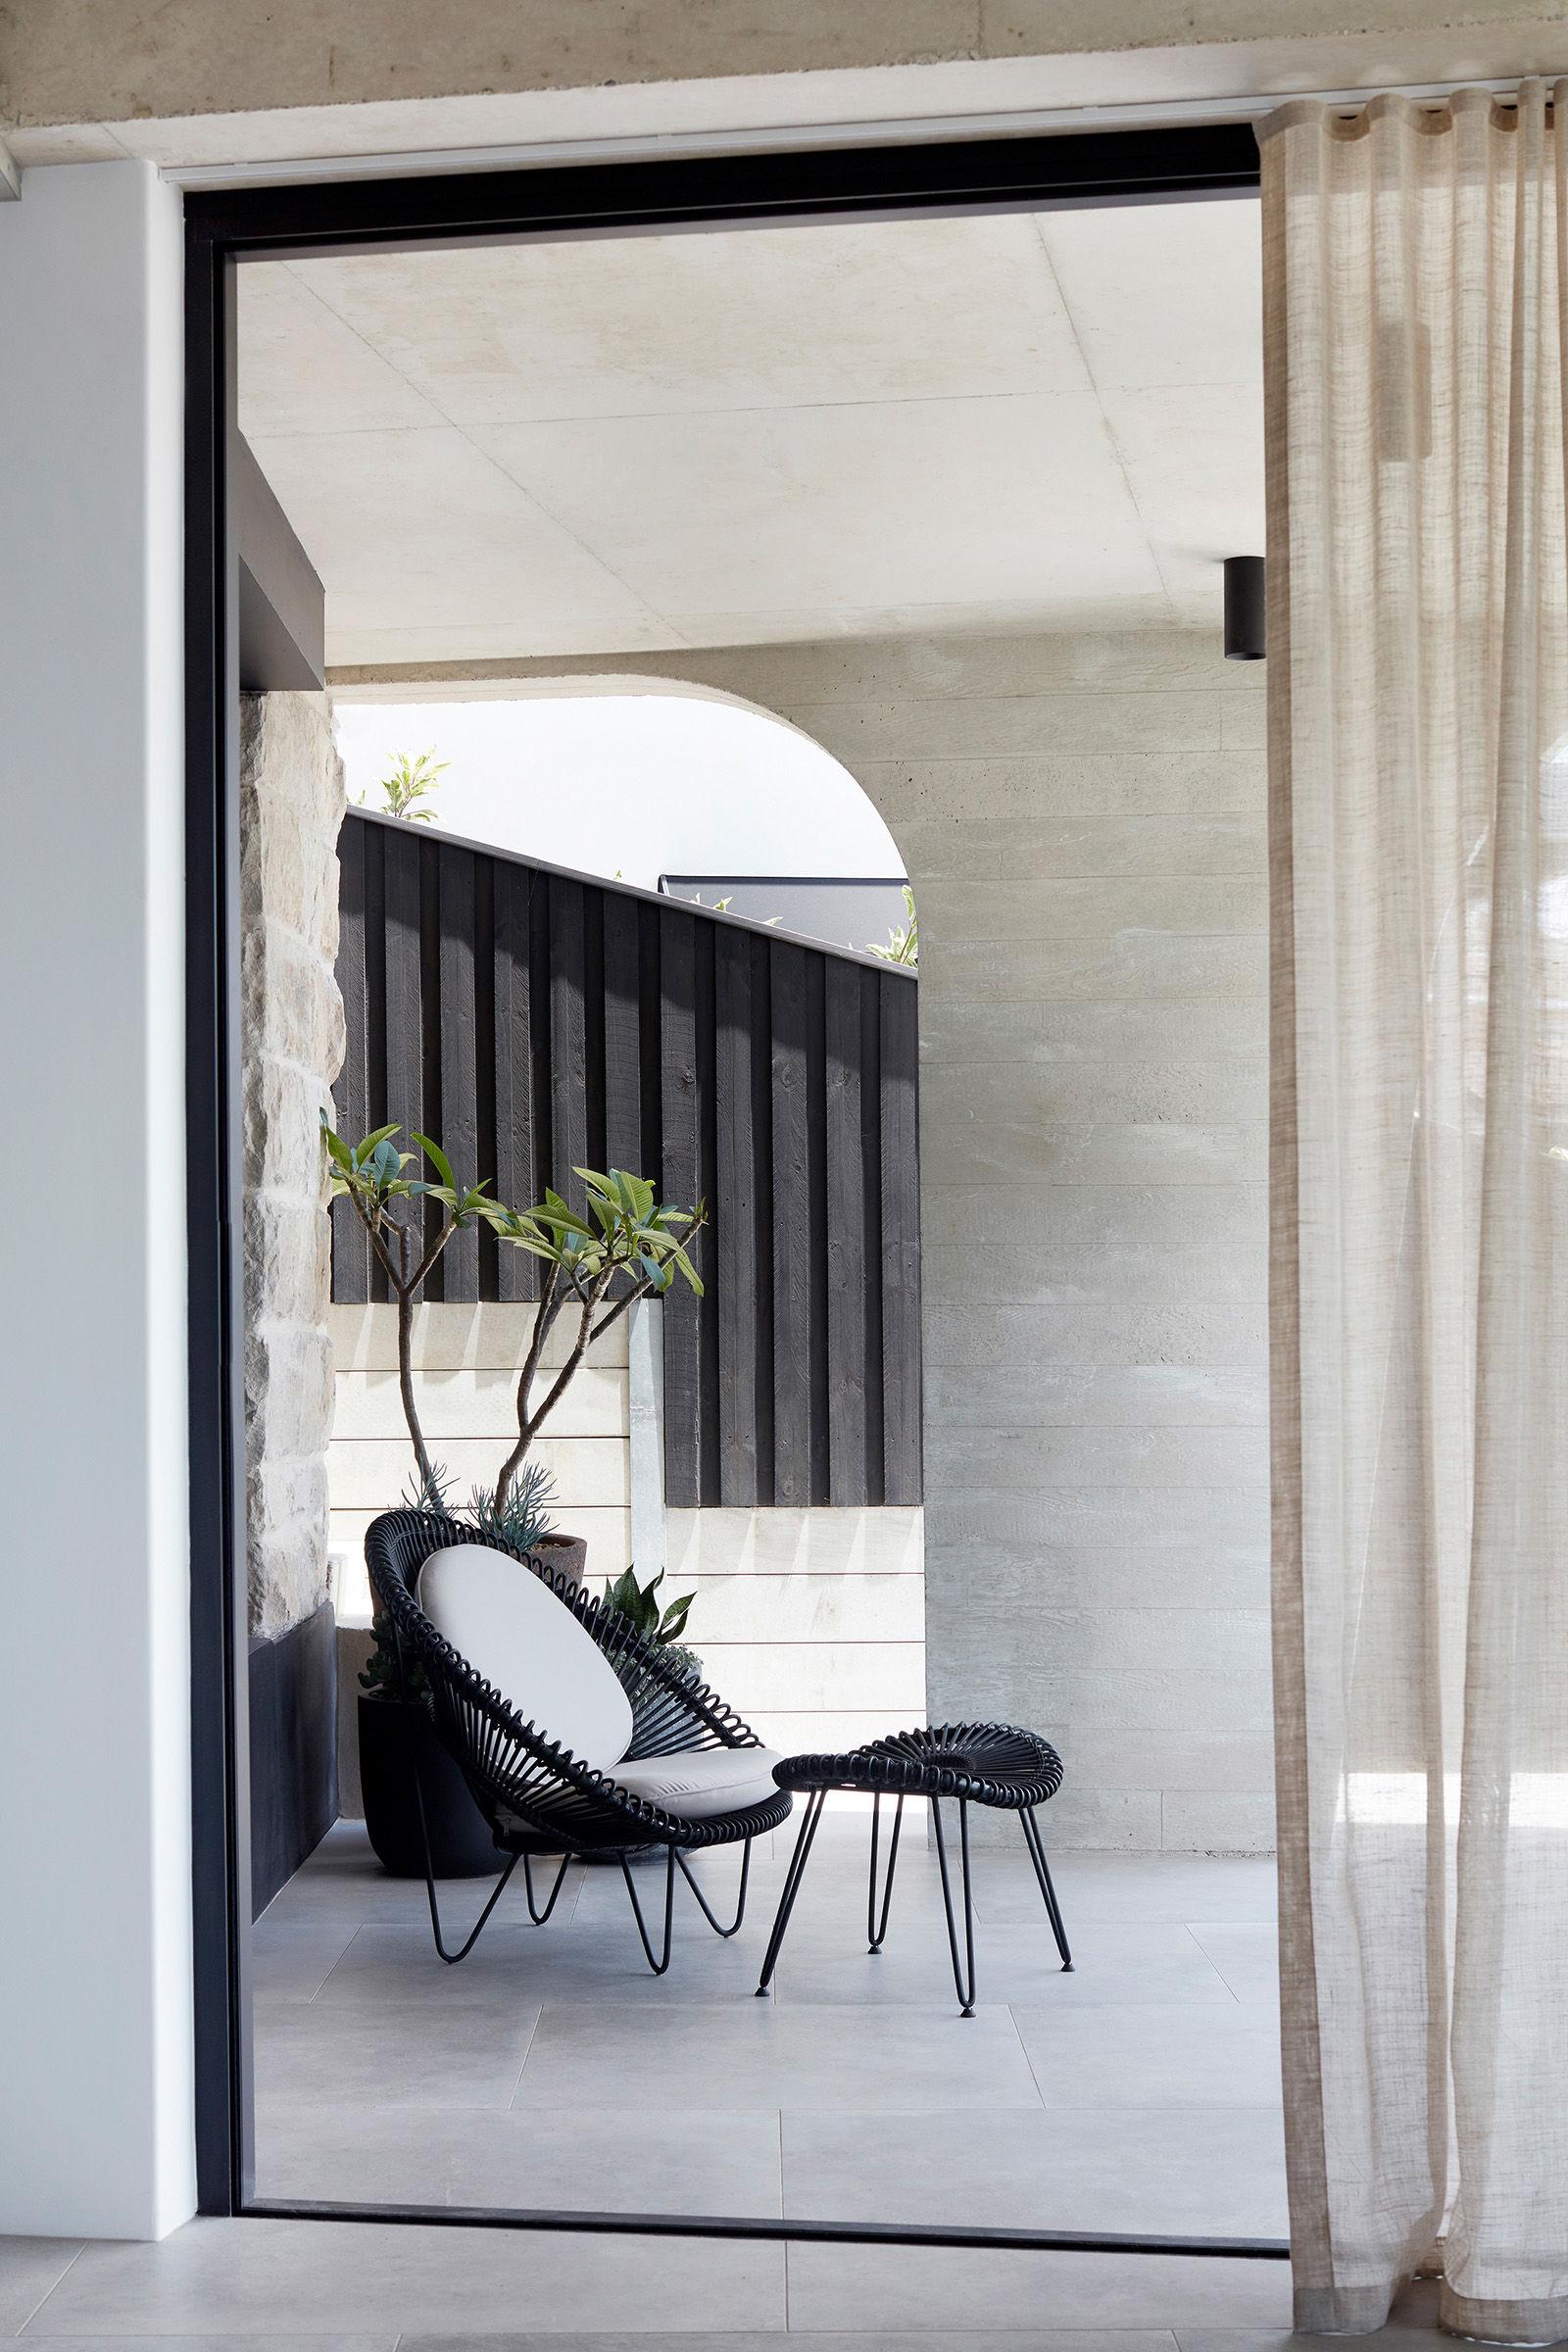 luigi-rosselli-architects---tamas-tee-home----006.jpg